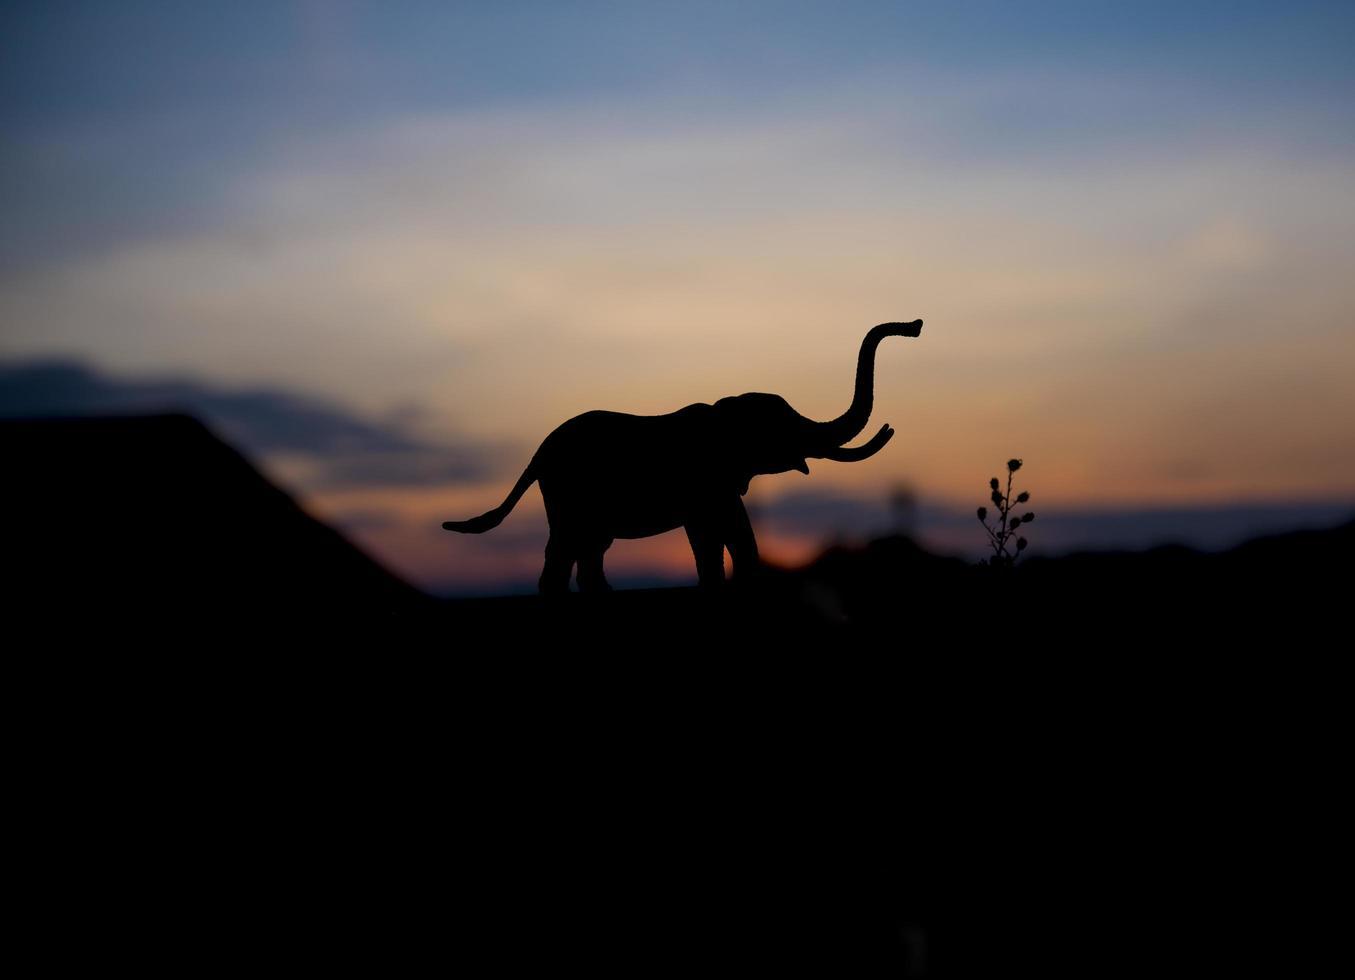 silhouet van olifantsdier bij zonsondergangachtergrond foto